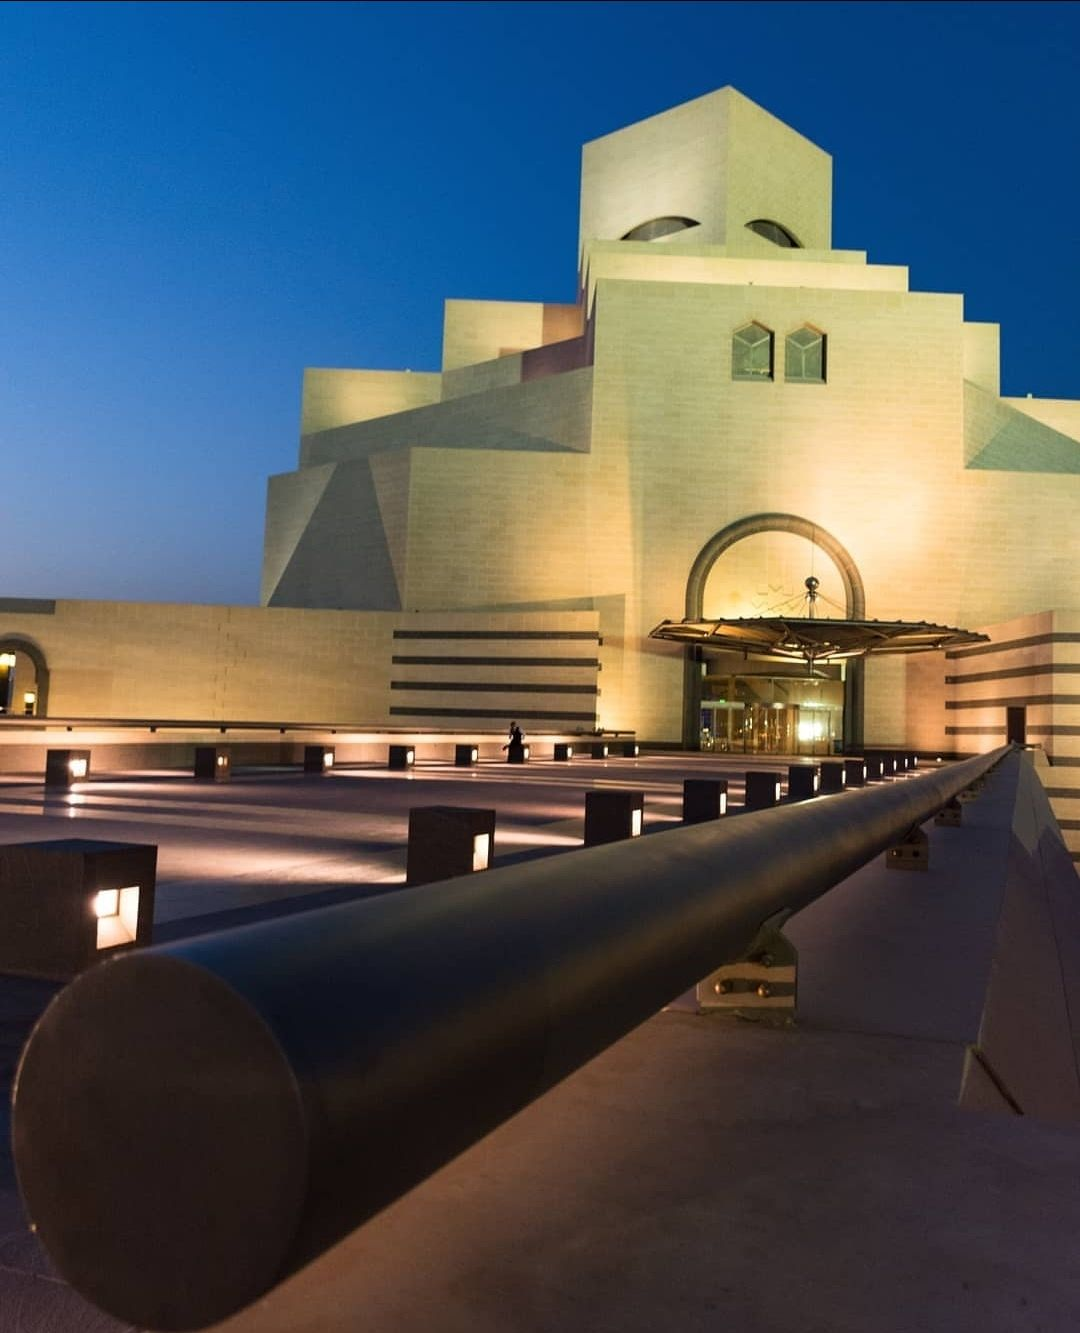 Photo of Museum of Islamic Art By Sandeep Sreedhar